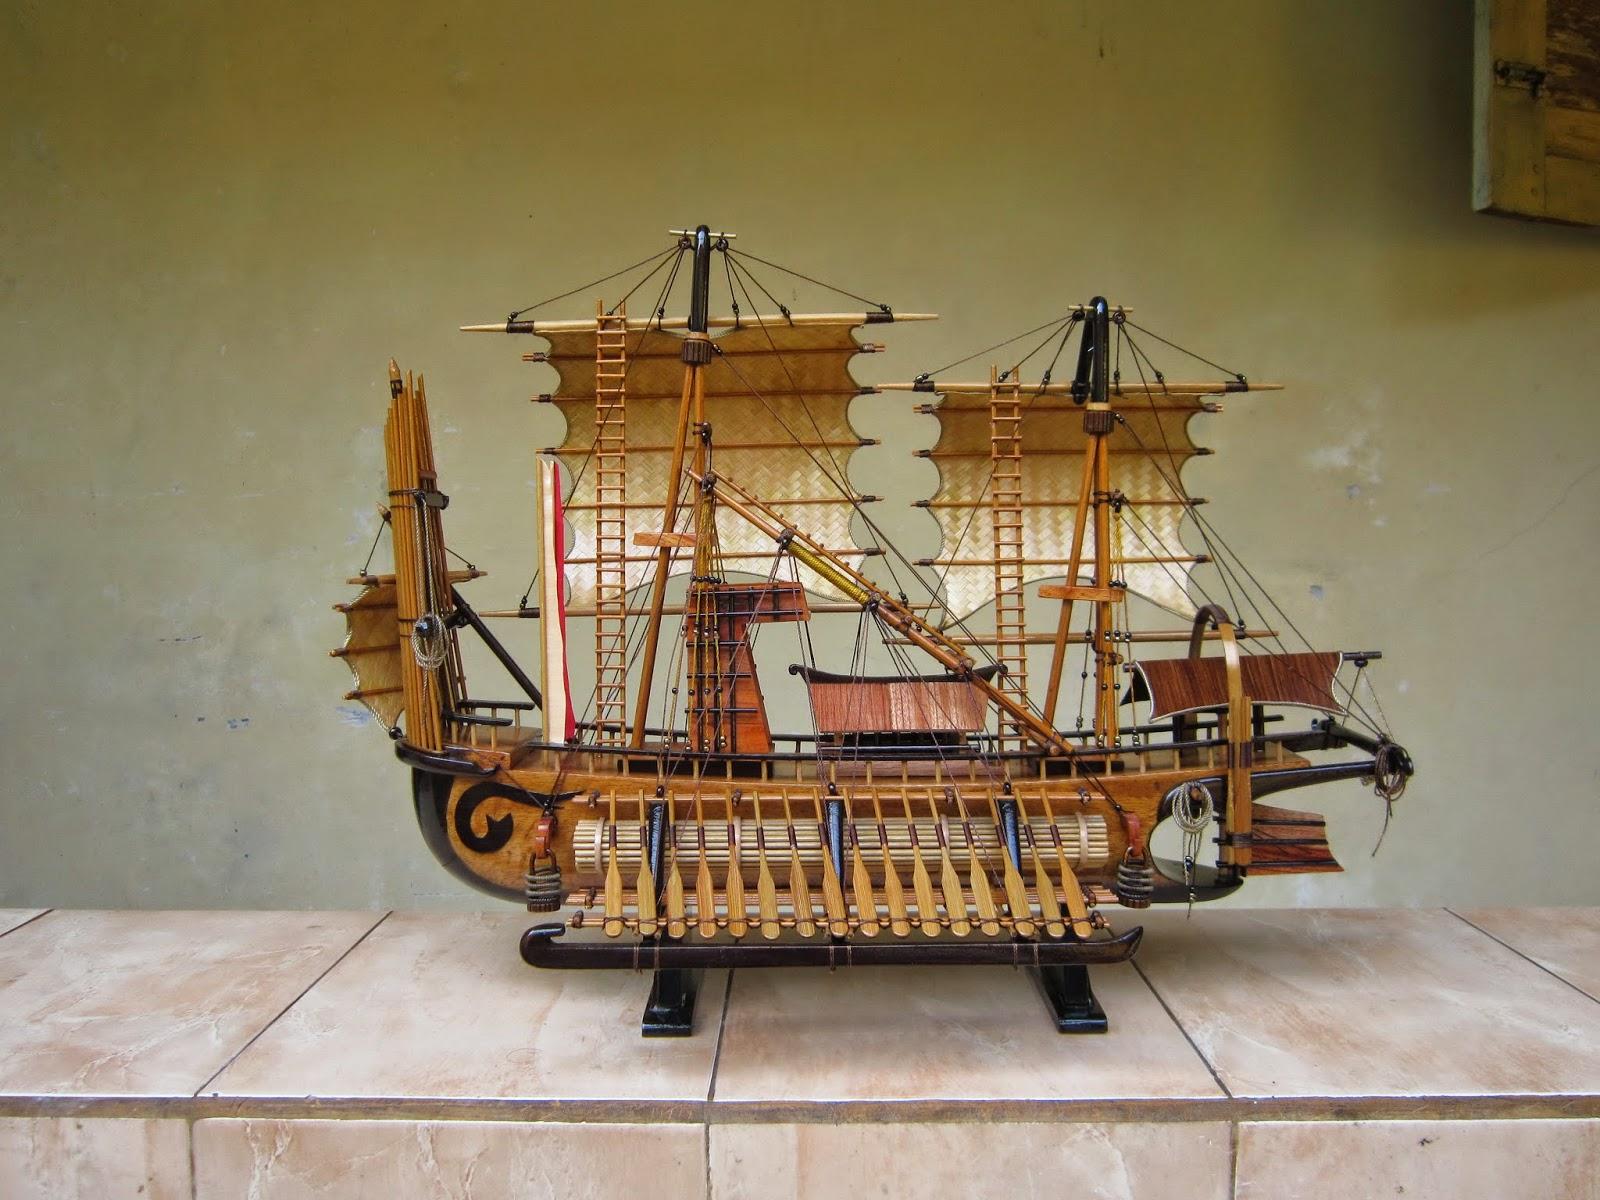 Miniatur kapal Layar Majapahit, miniatur kapal laut, miniatur kapal layar, miniatur kapal mojokerto, souvenir unik